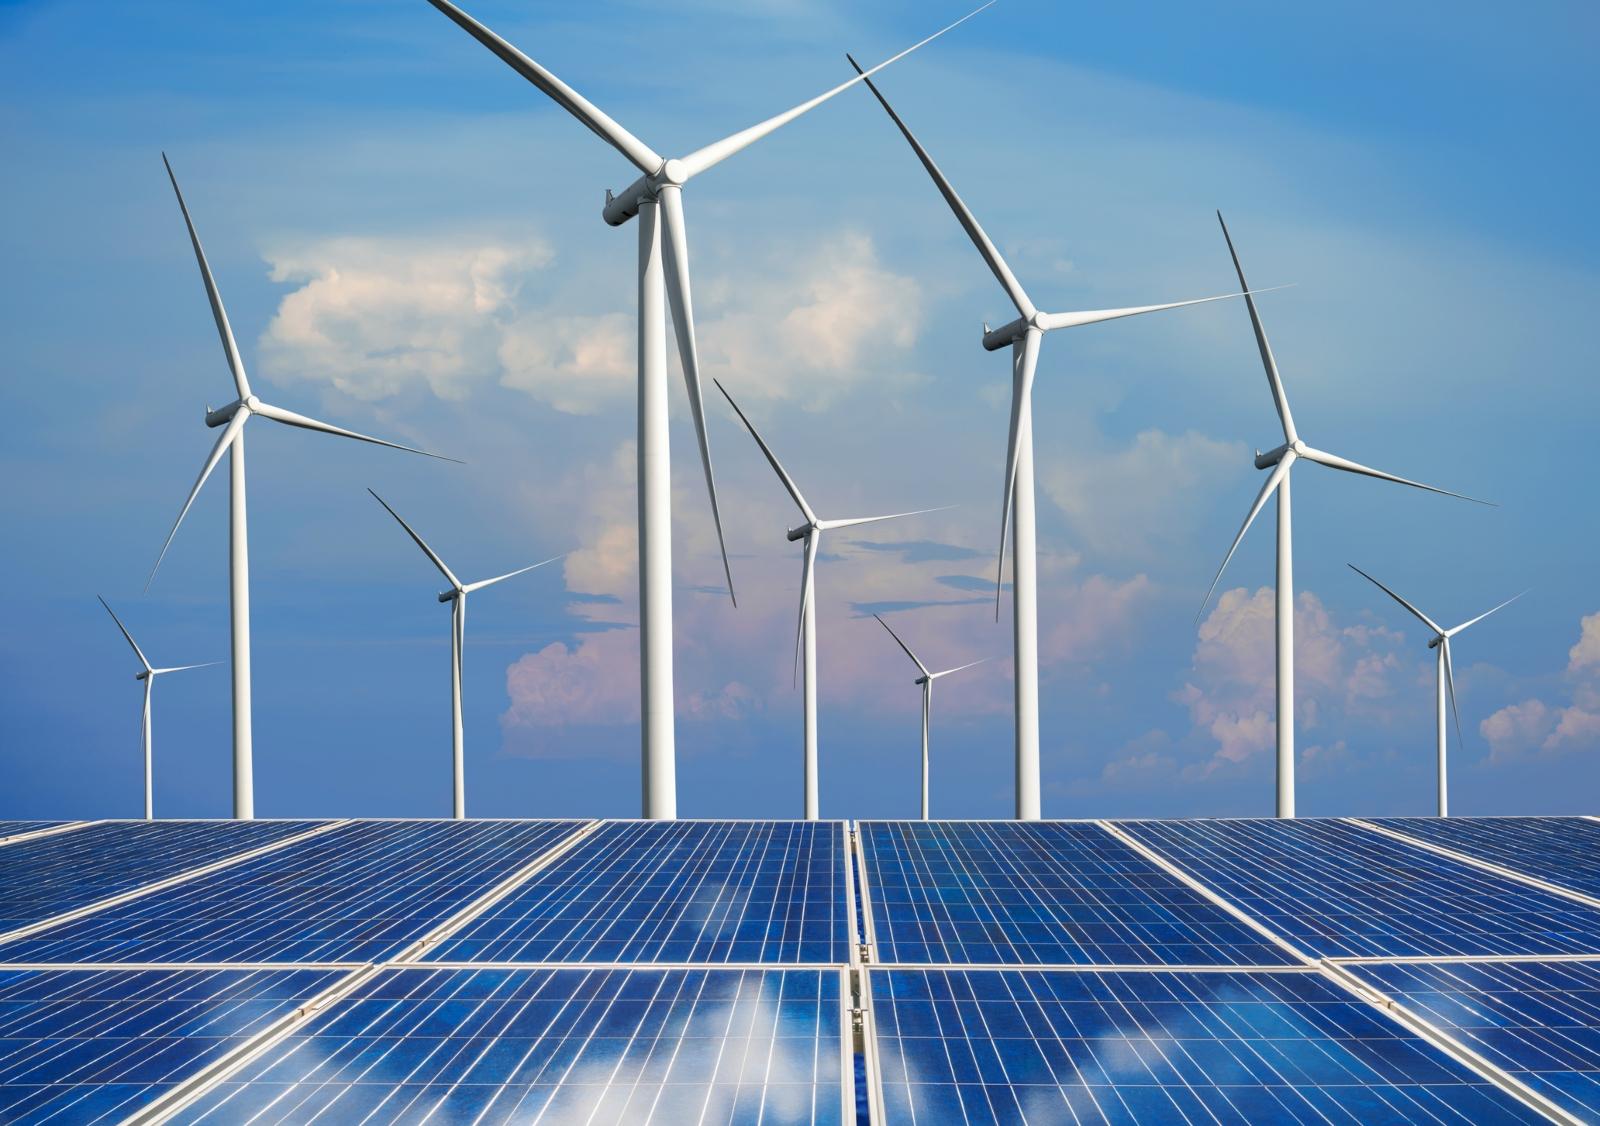 Painéis solares e parque eólico